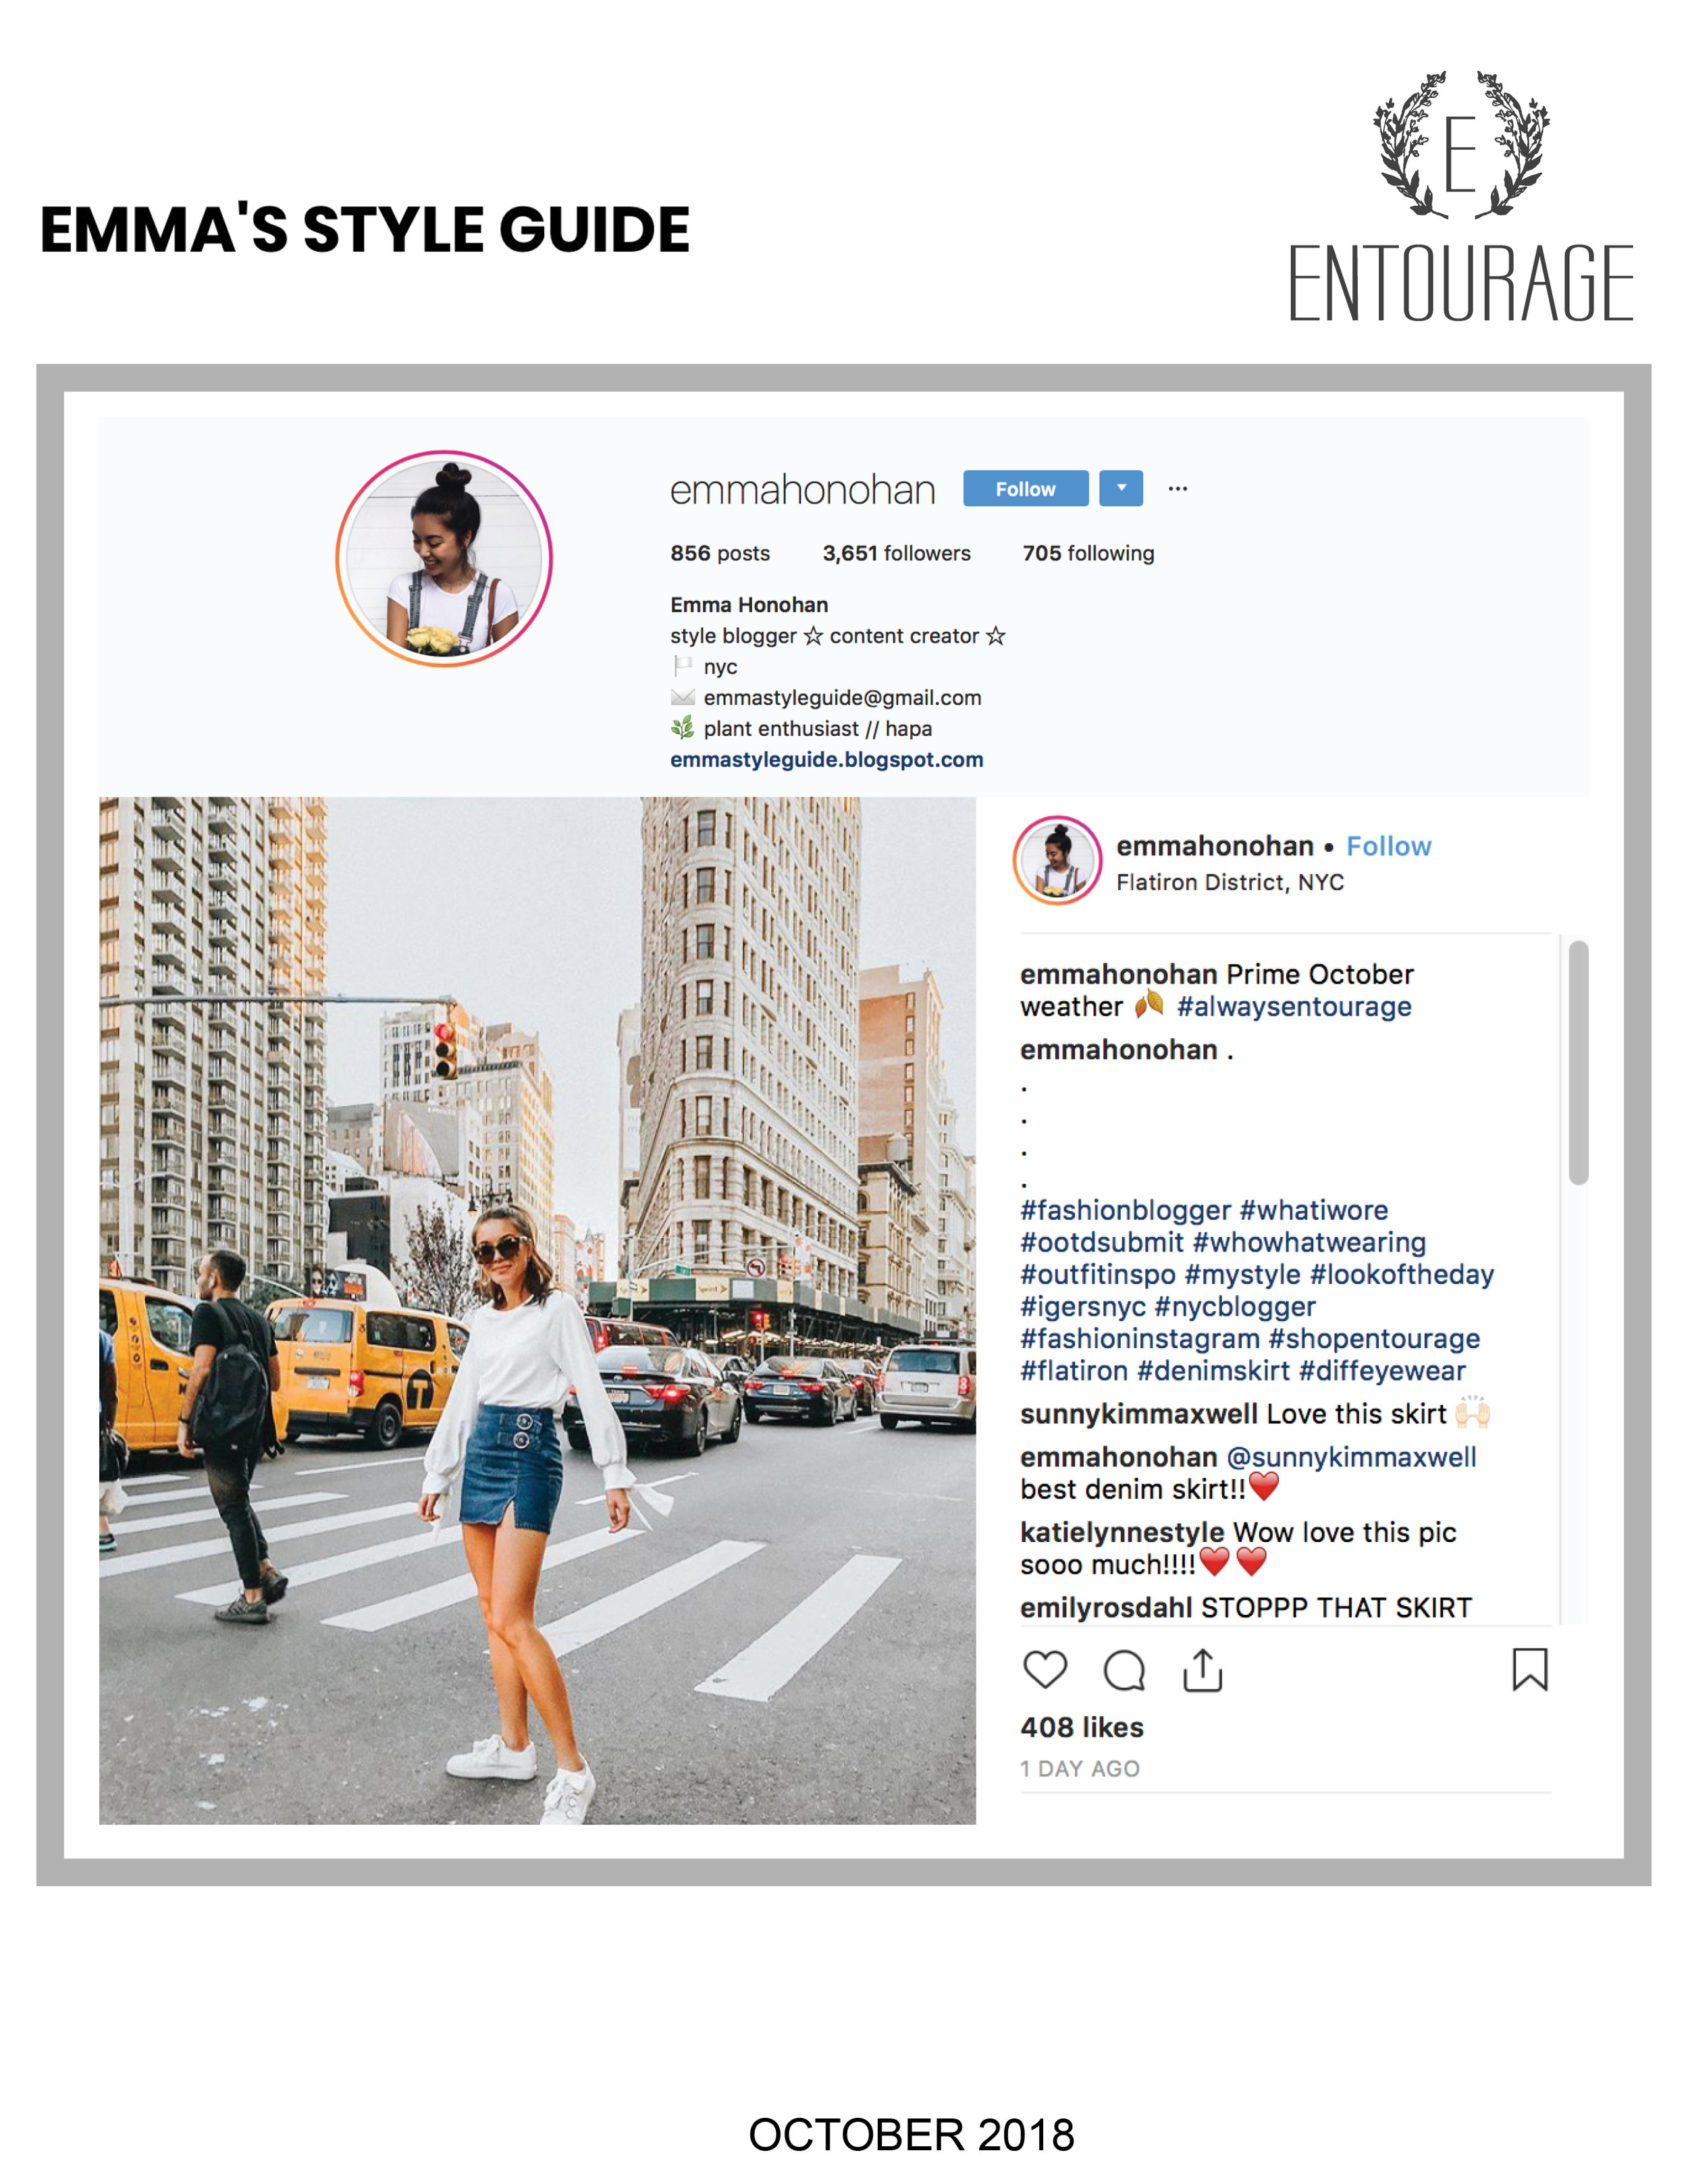 Entourage_EmmaHonohan_October2018.jpg